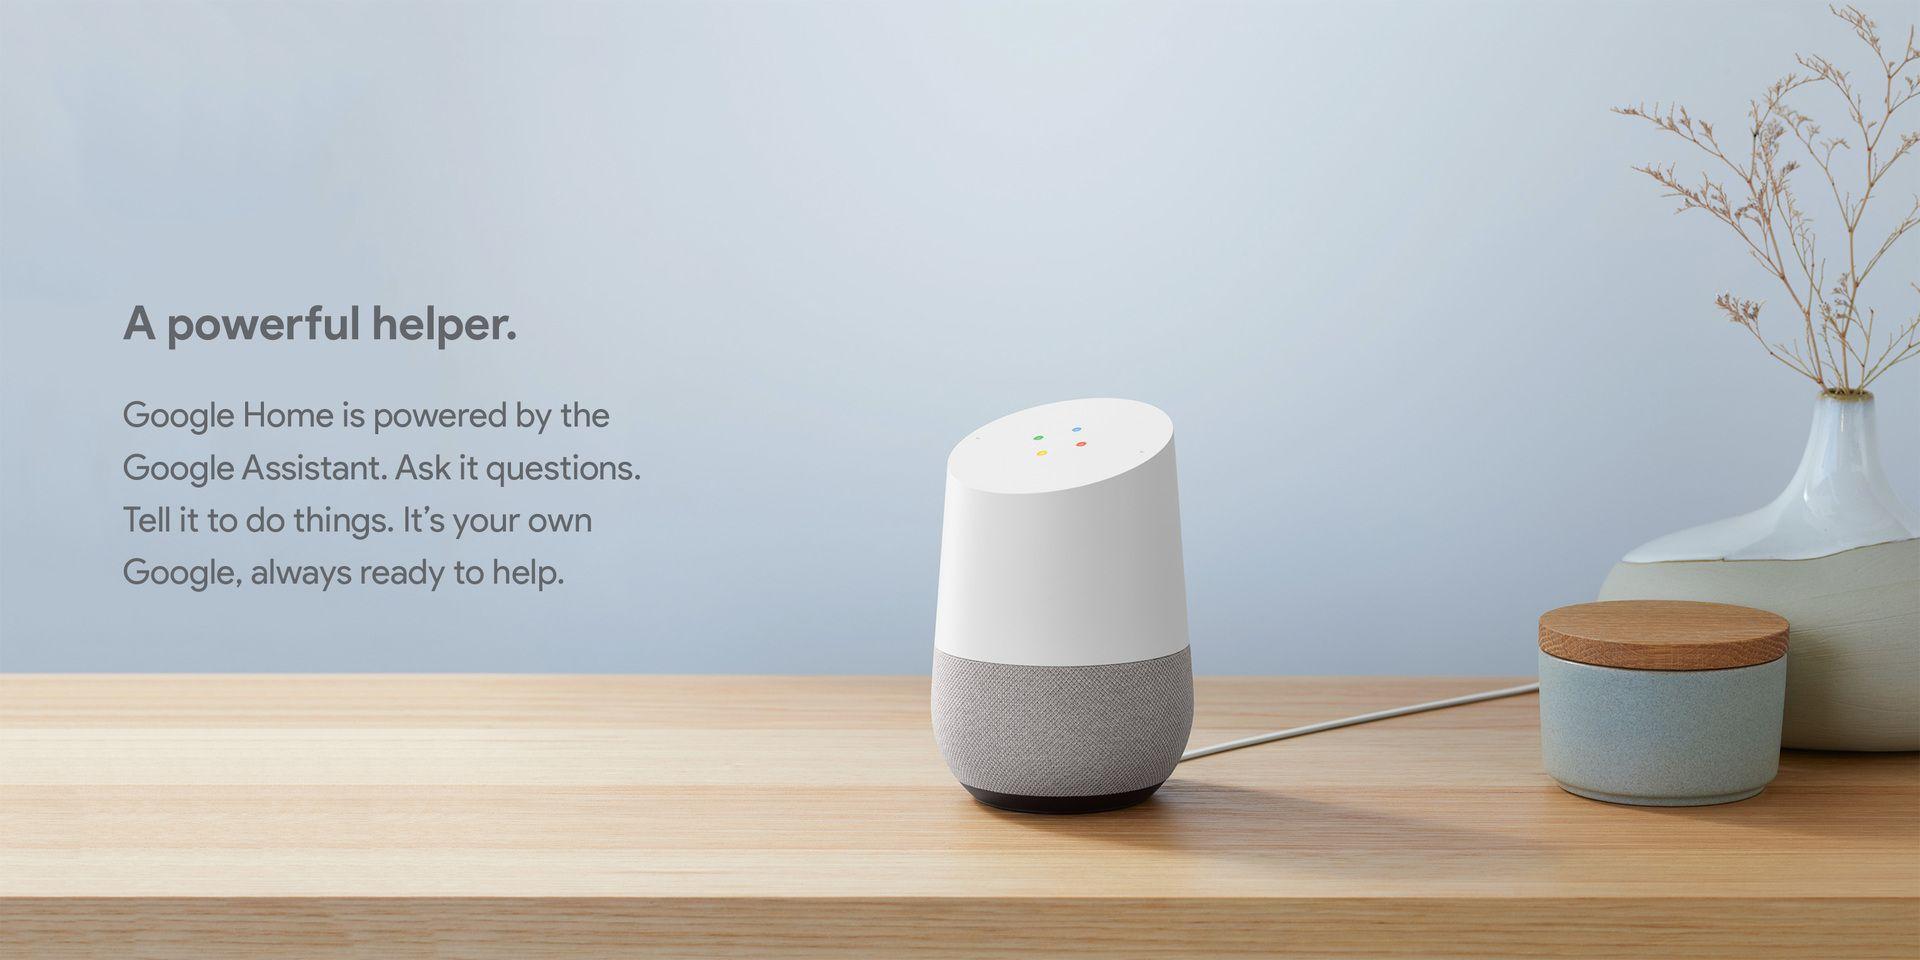 Https Www Target Com P Google Home Smart Speaker With Google Assistant A 51513049 Google Home Smart Home Google